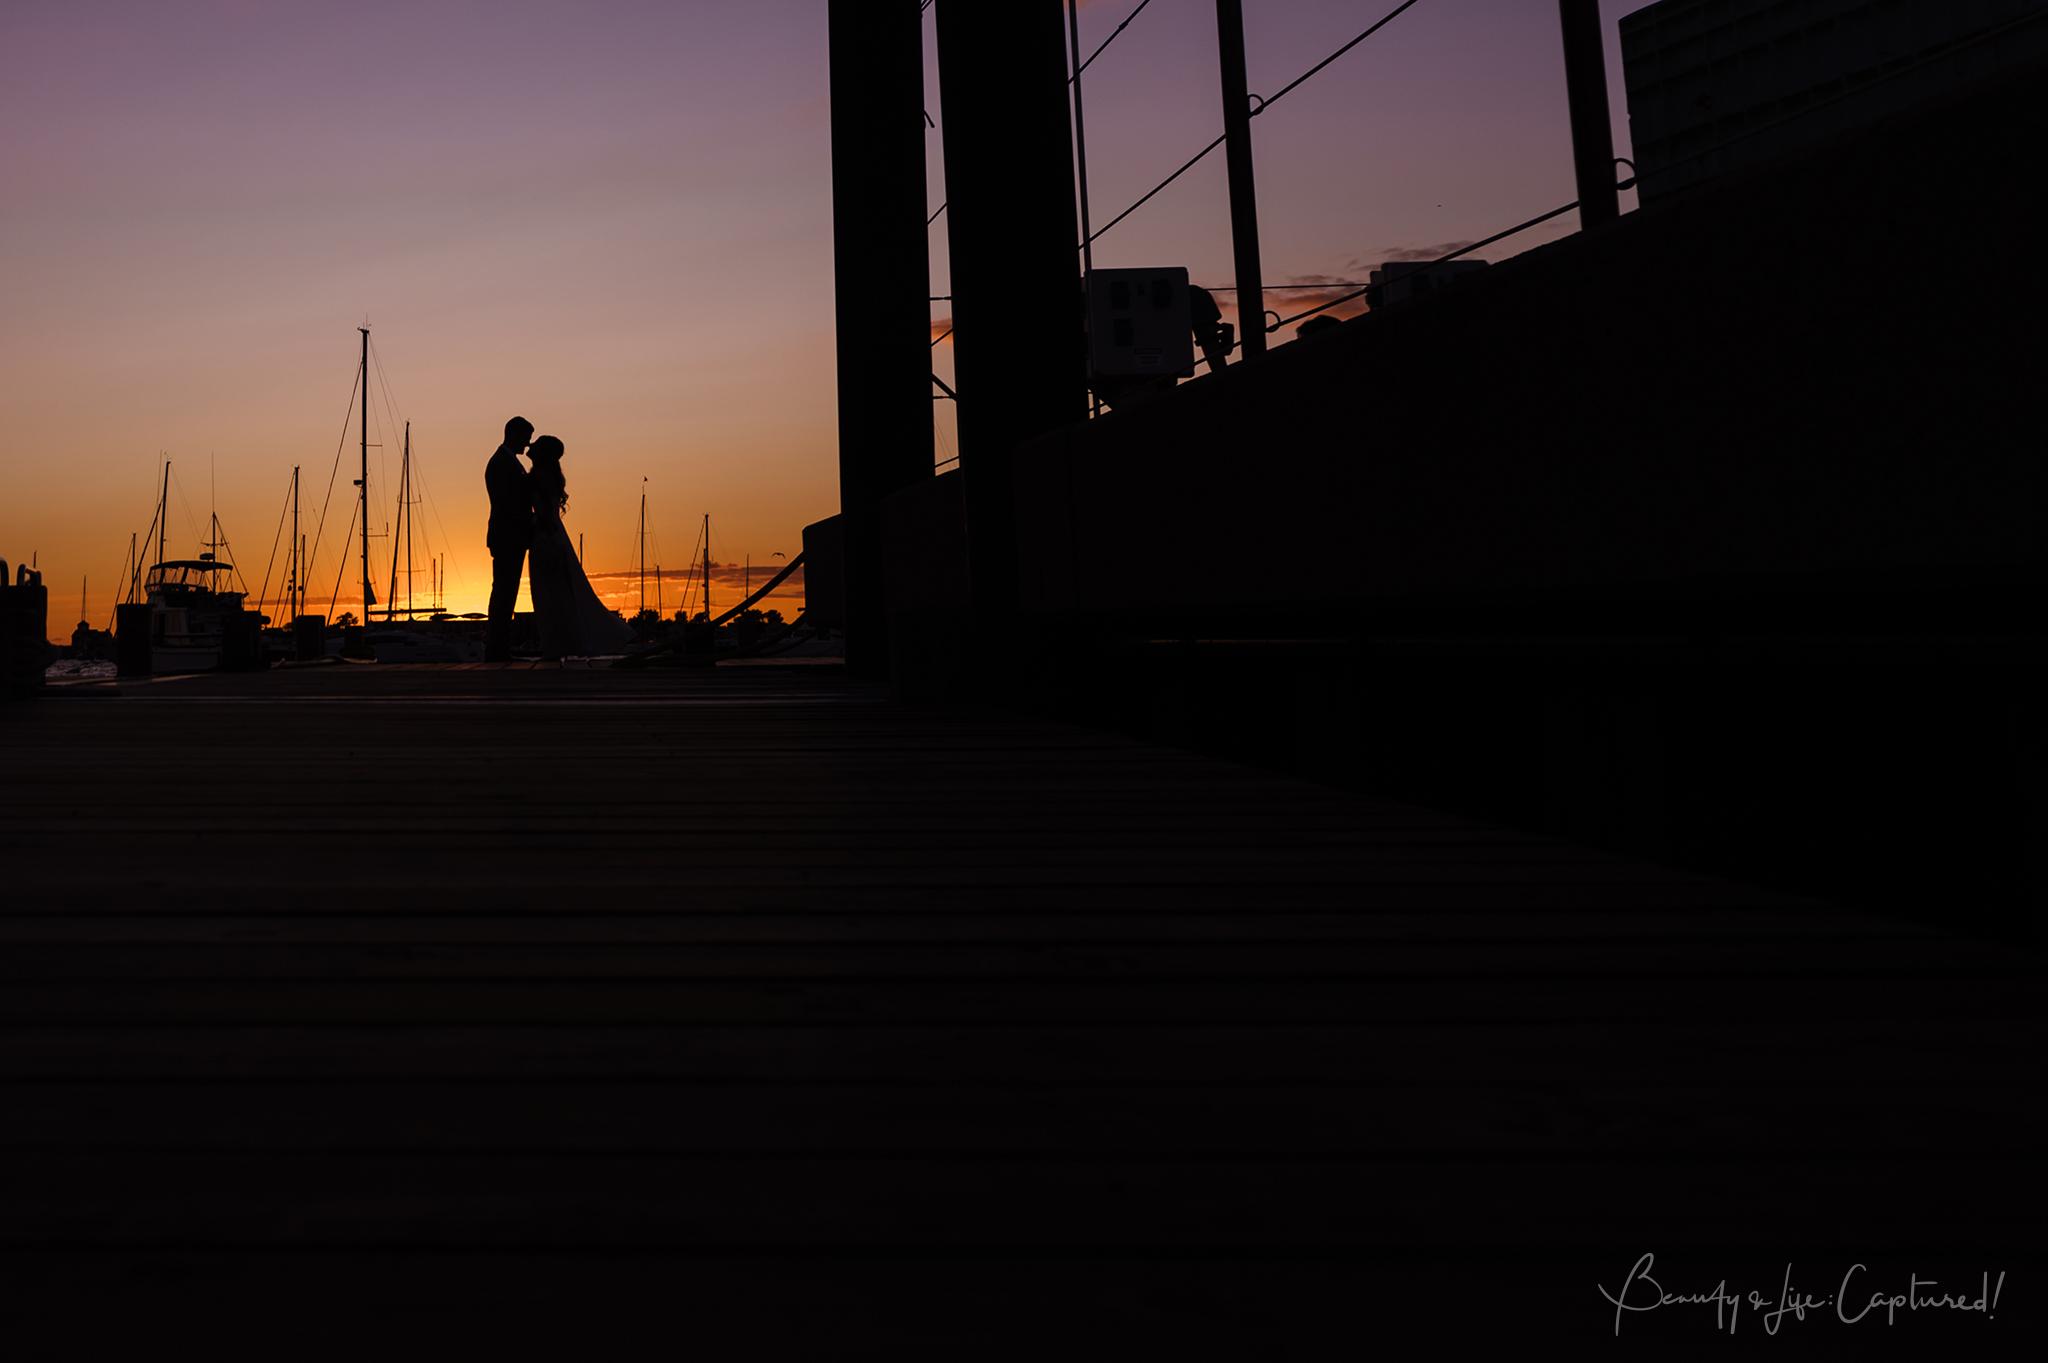 Beauty_and_Life_Captured_Athena_Wedding-20.jpg